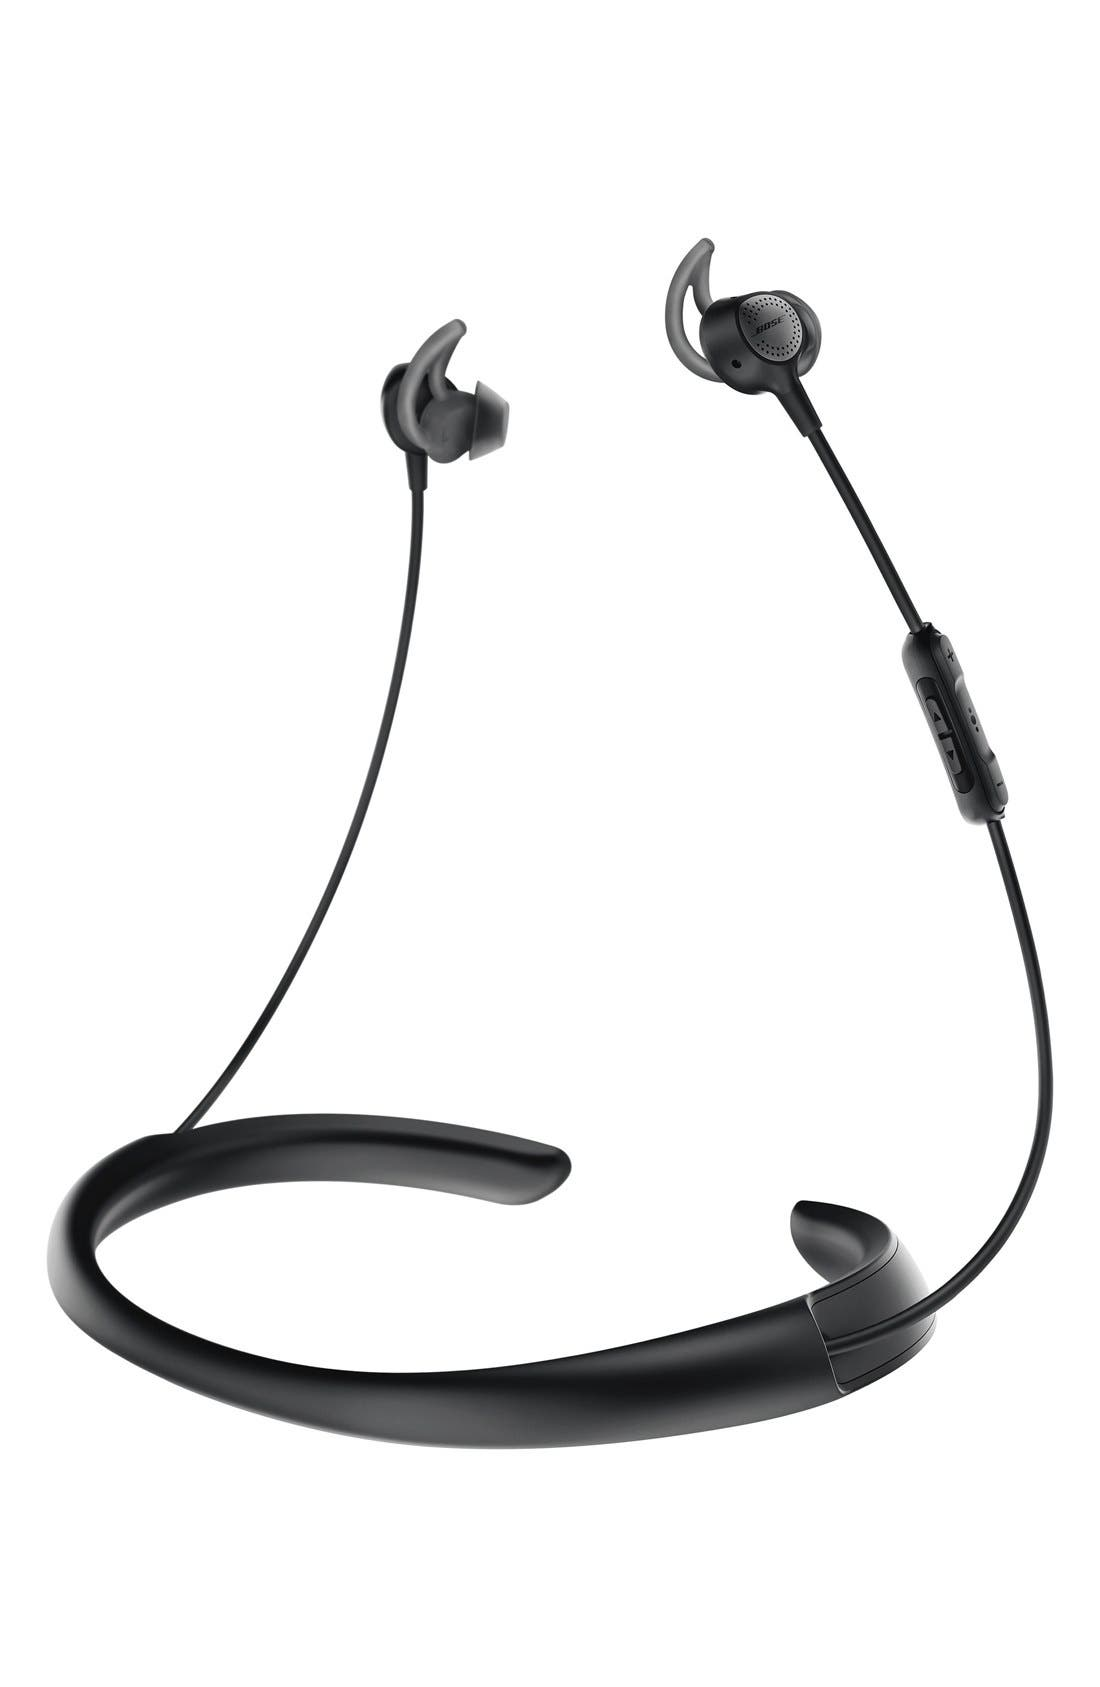 Main Image - Bose® QuietControl® 30 In-Ear Noise Canceling Wireless Headphones